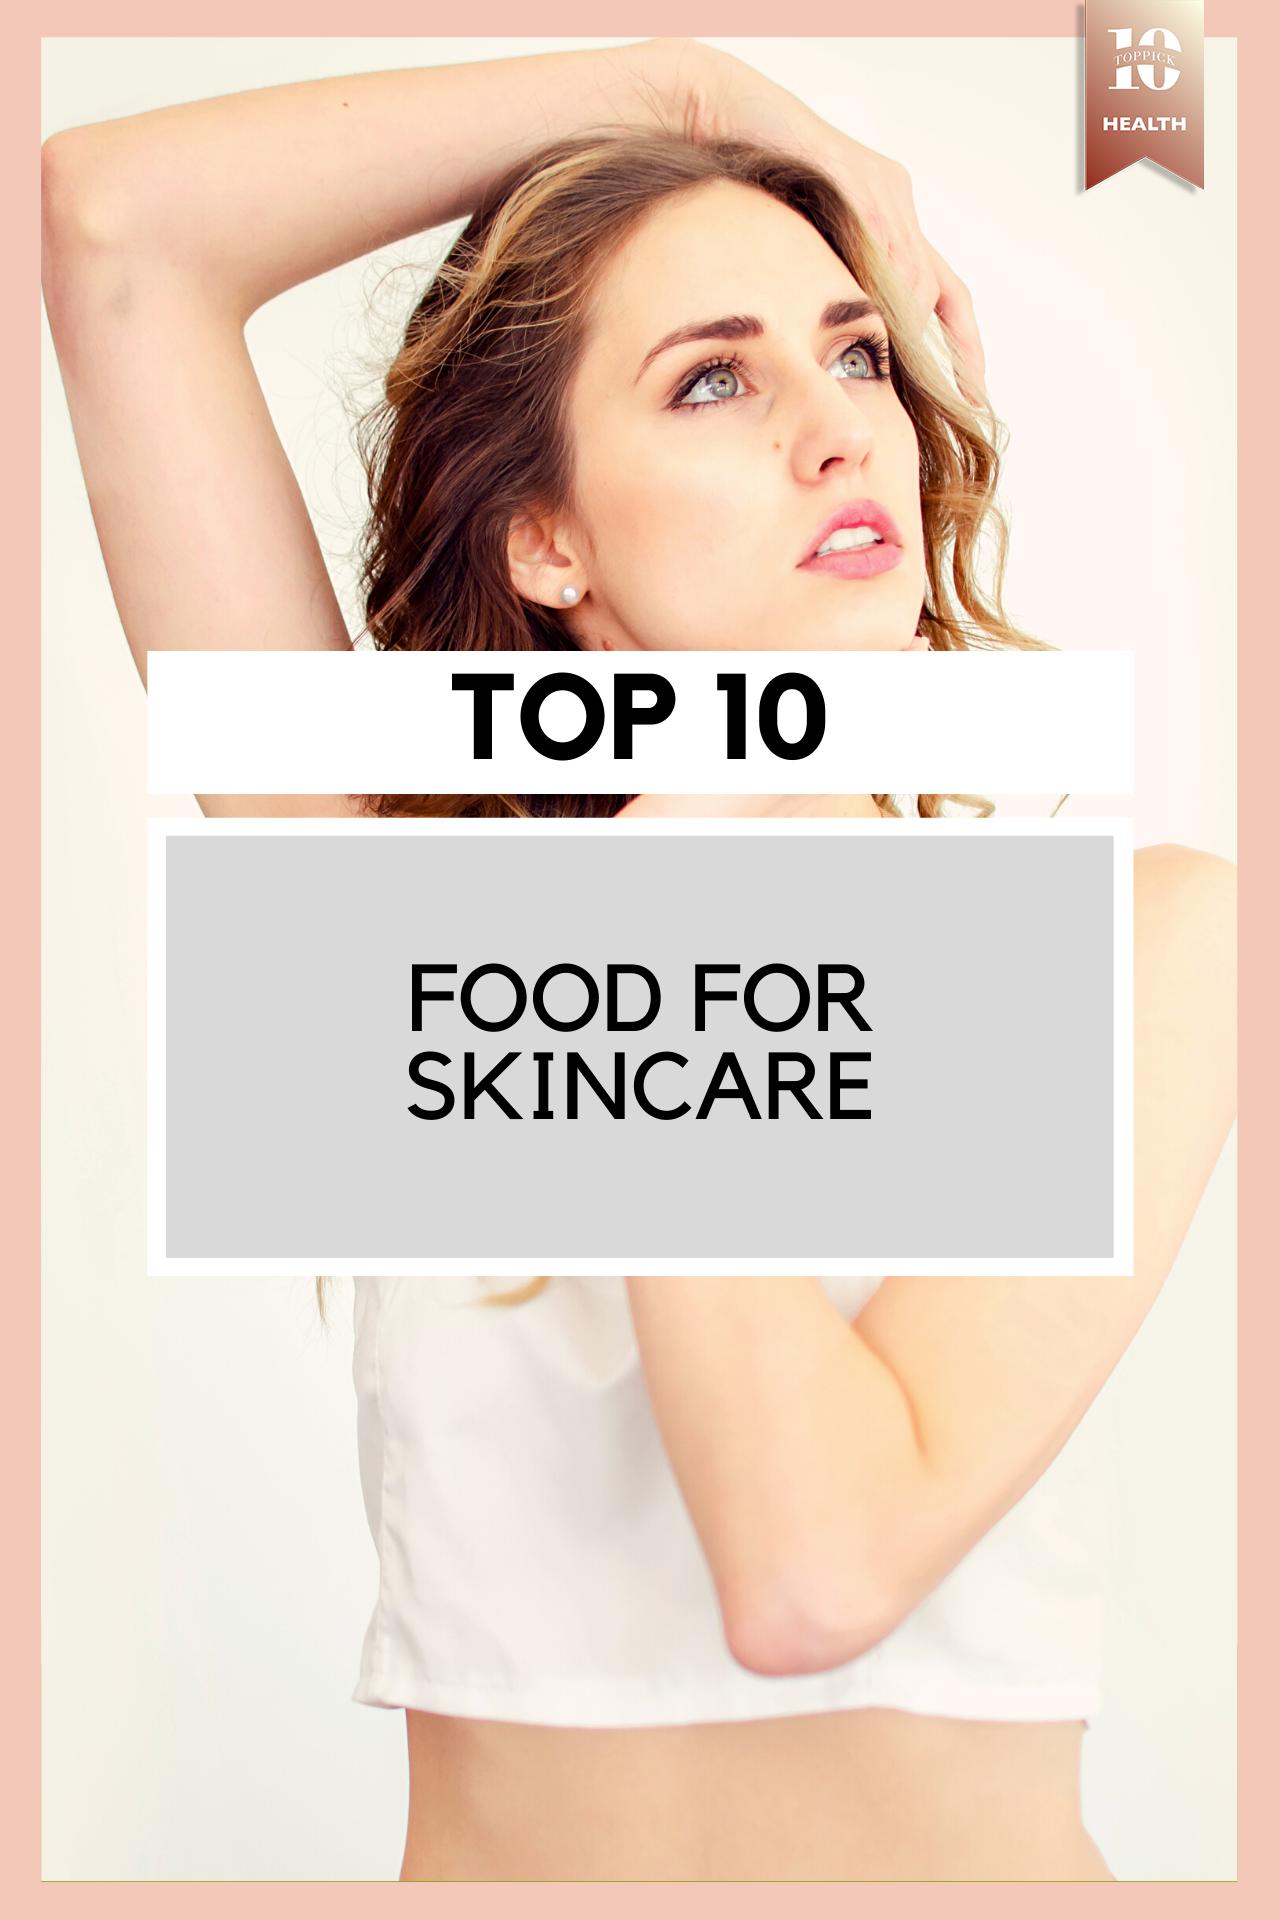 #food #skincare #beauty #natural #healthyeating #organicskincare #organicbeauty